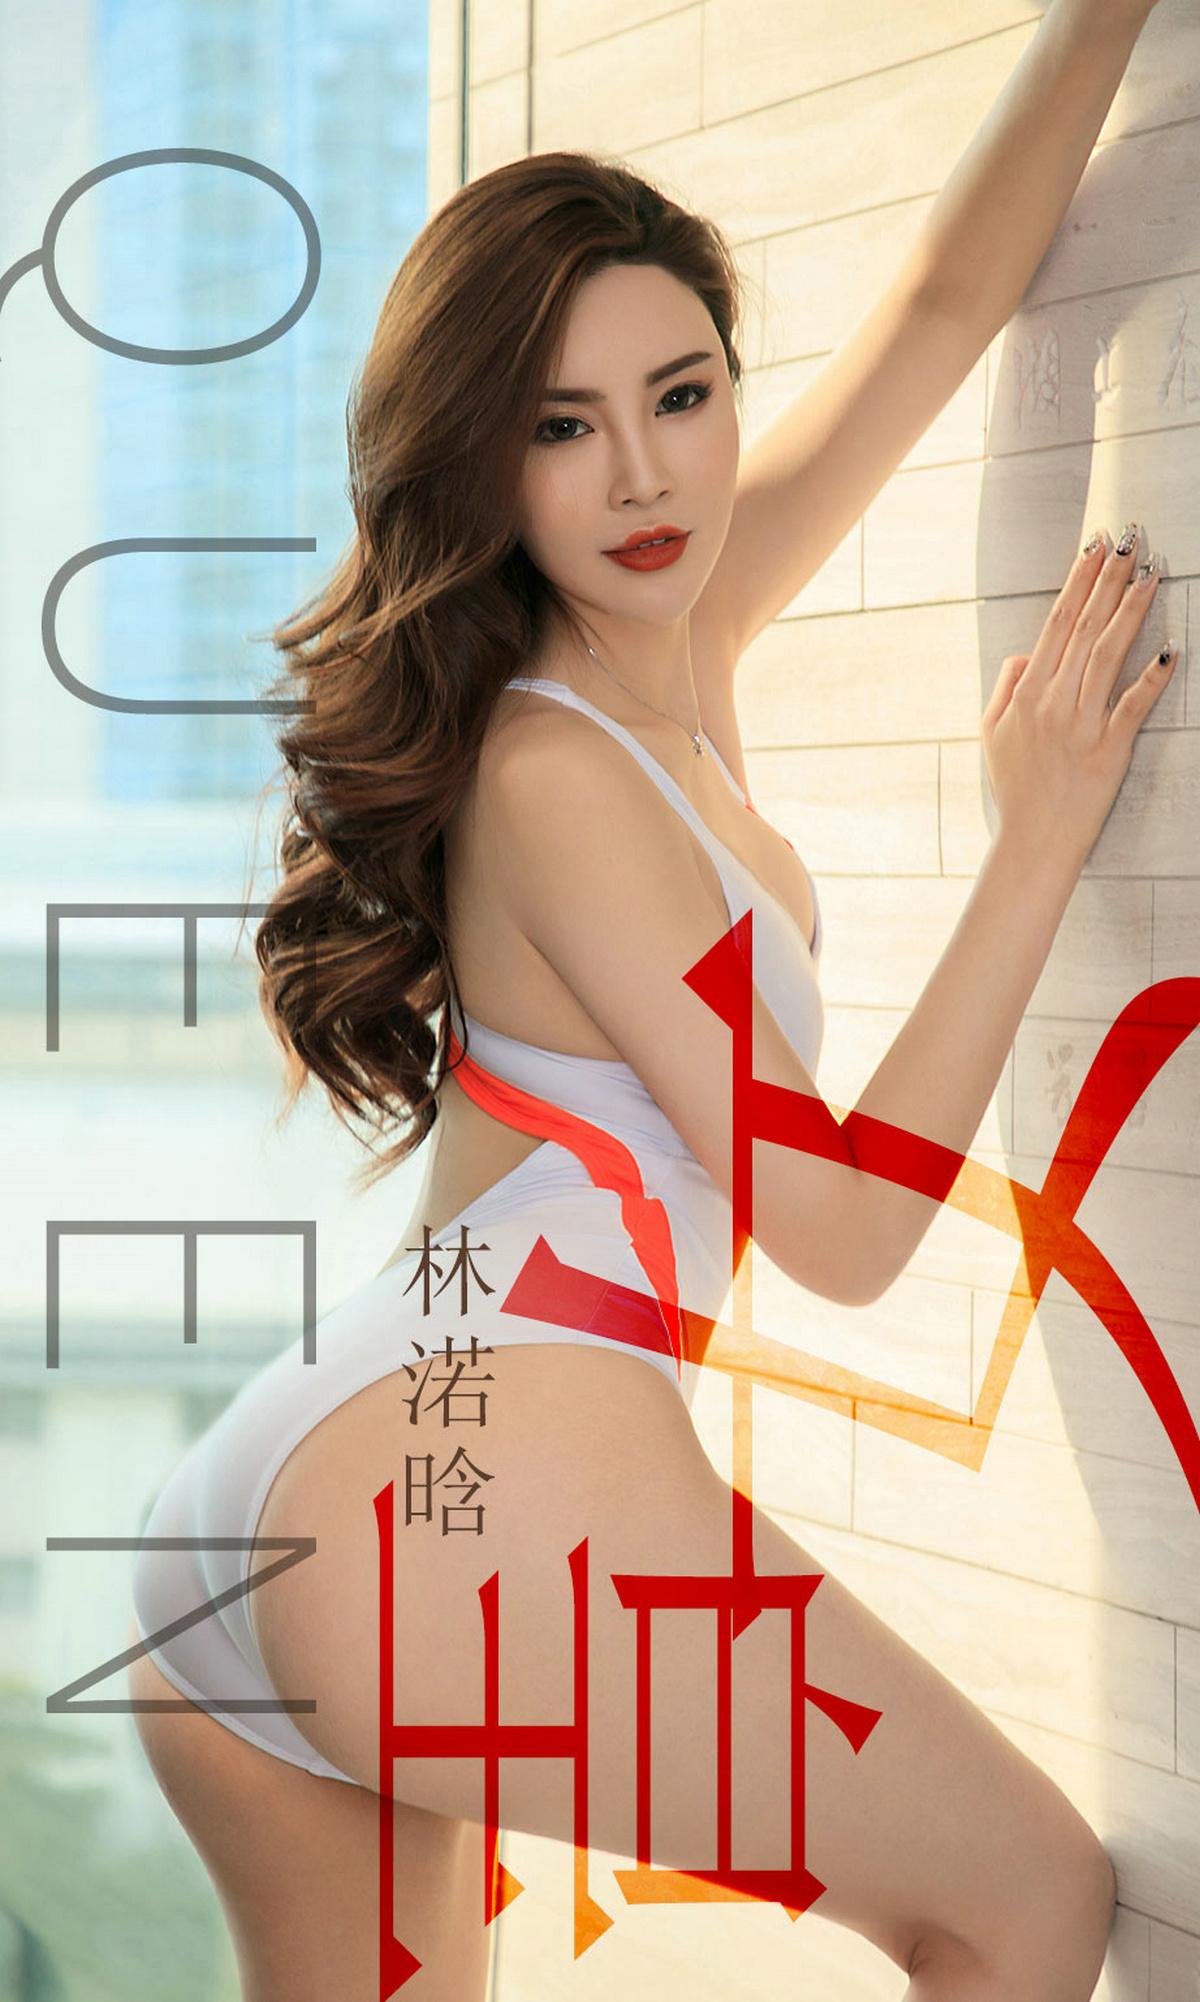 [Ugirls]爱尤物 No.1410 女皇 林渃晗 [35